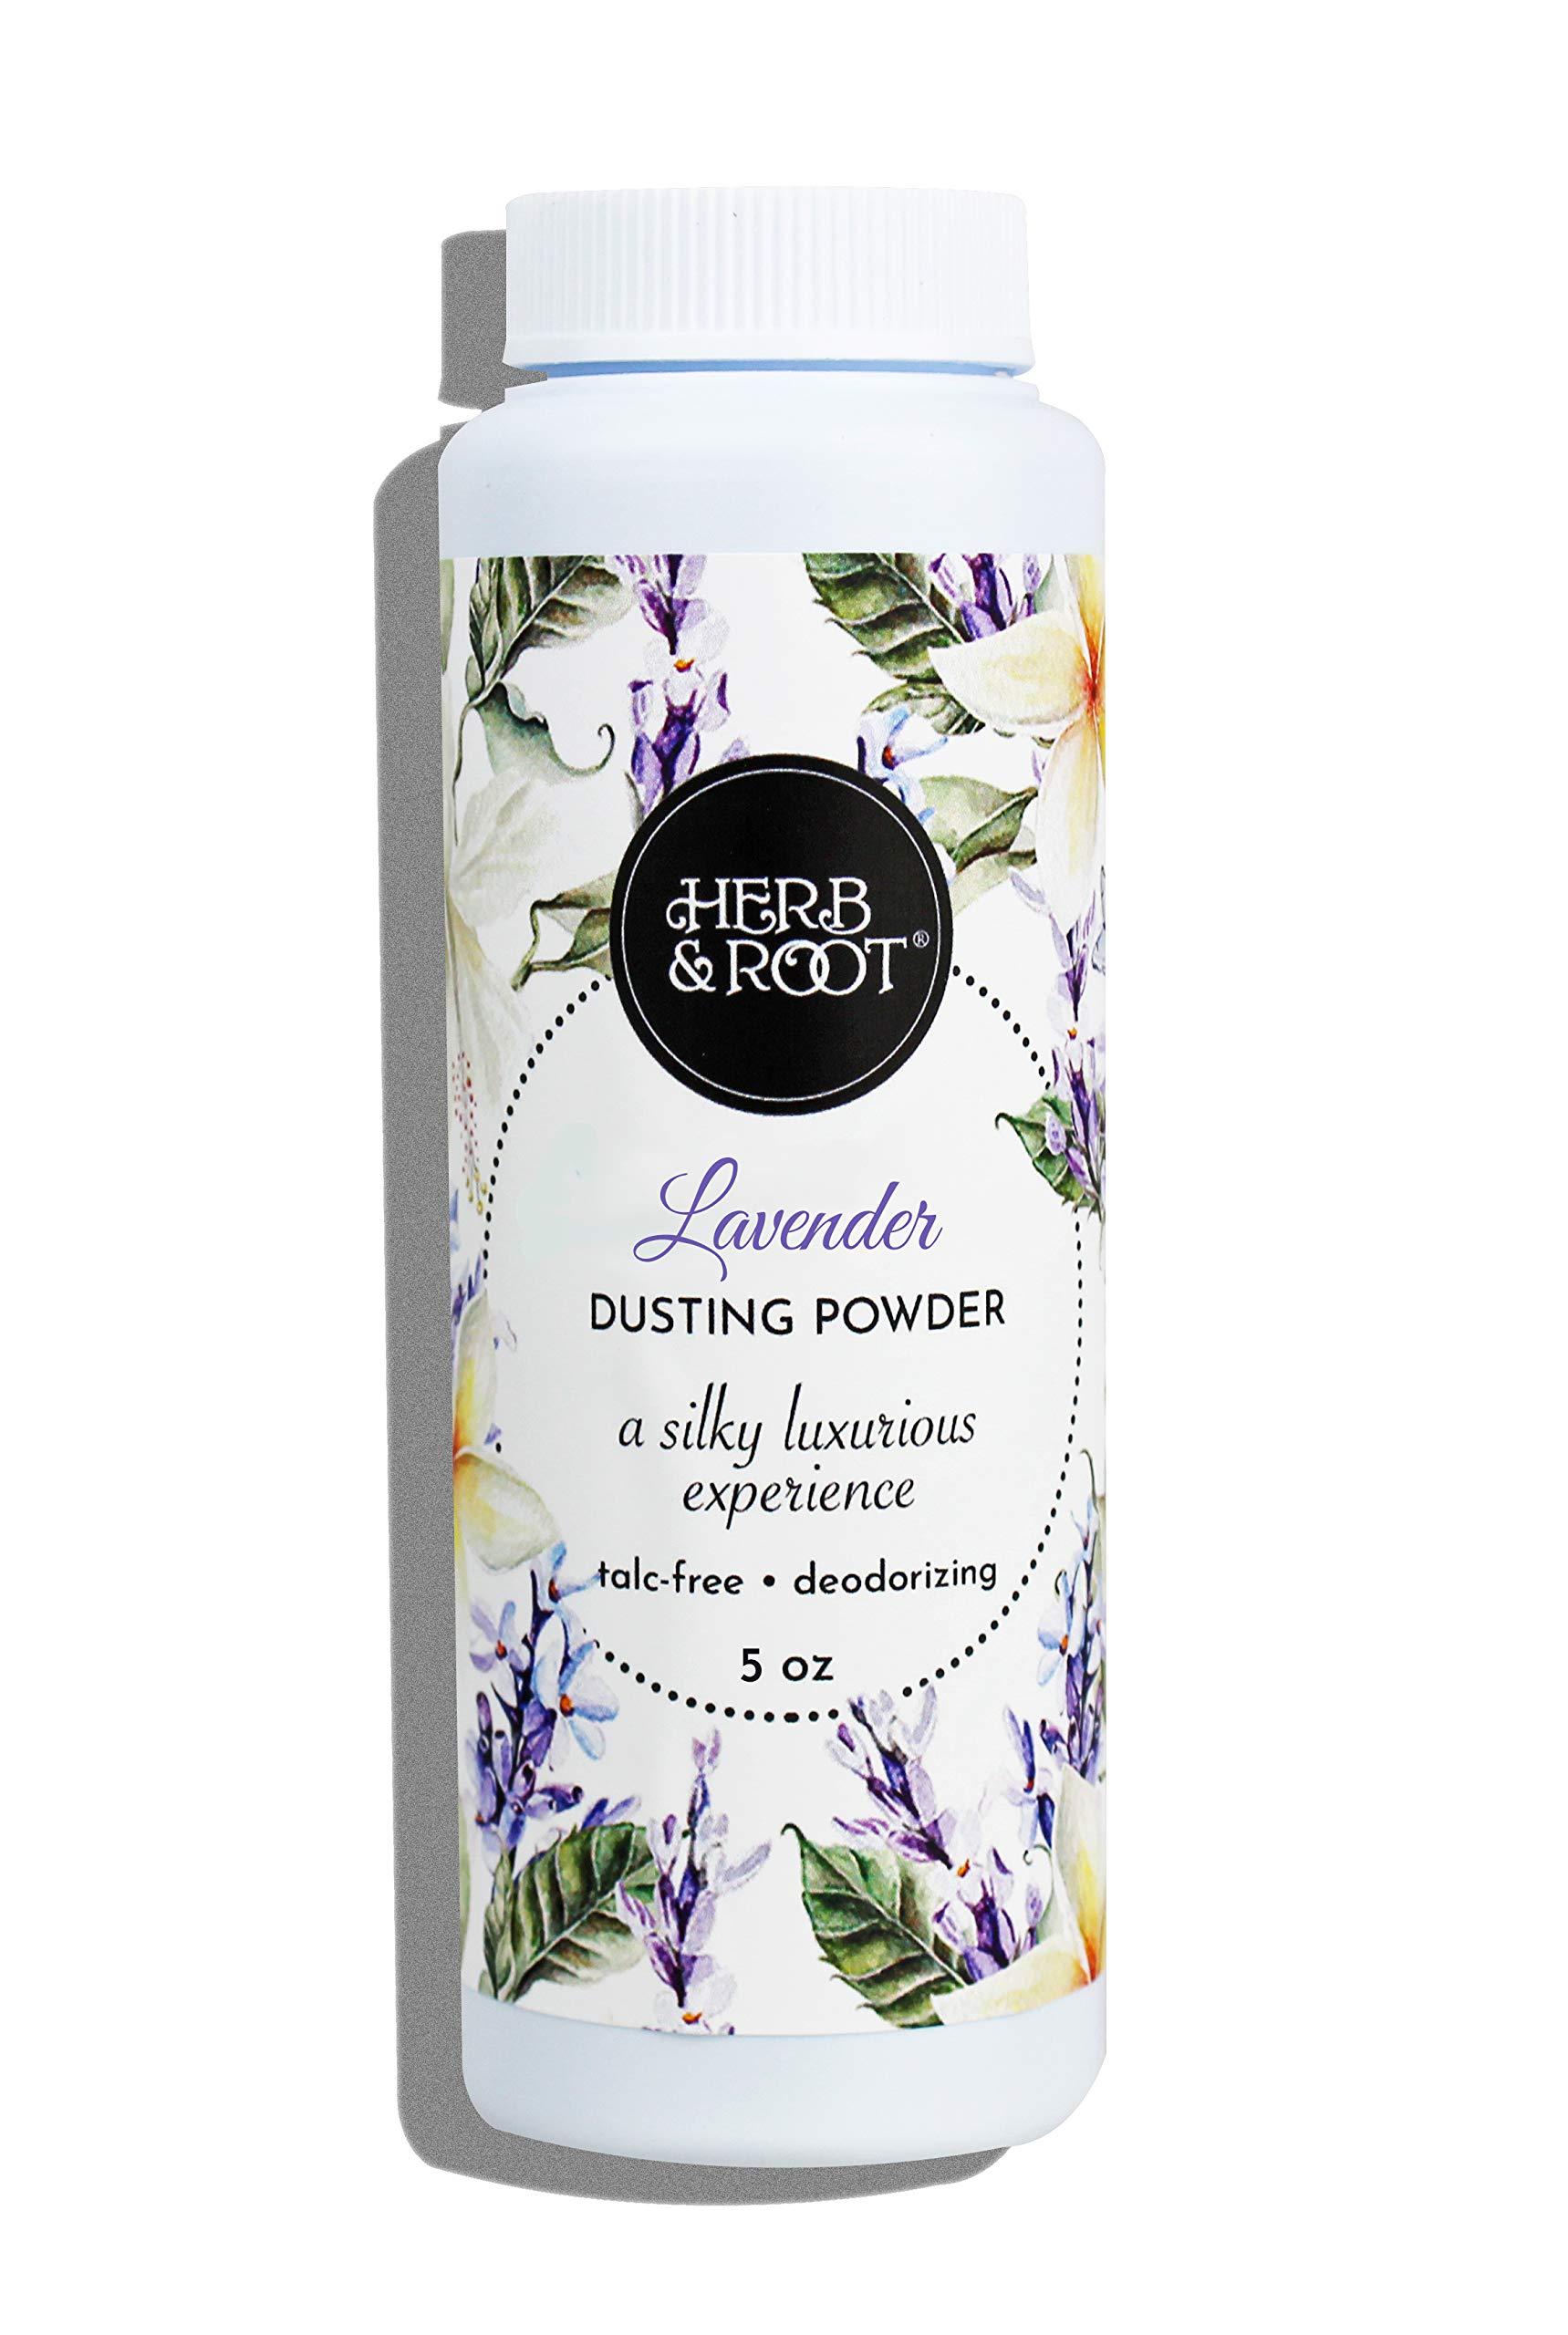 Lavender Body Dusting Powder Talc-Free for Women or Men | Herb & Root